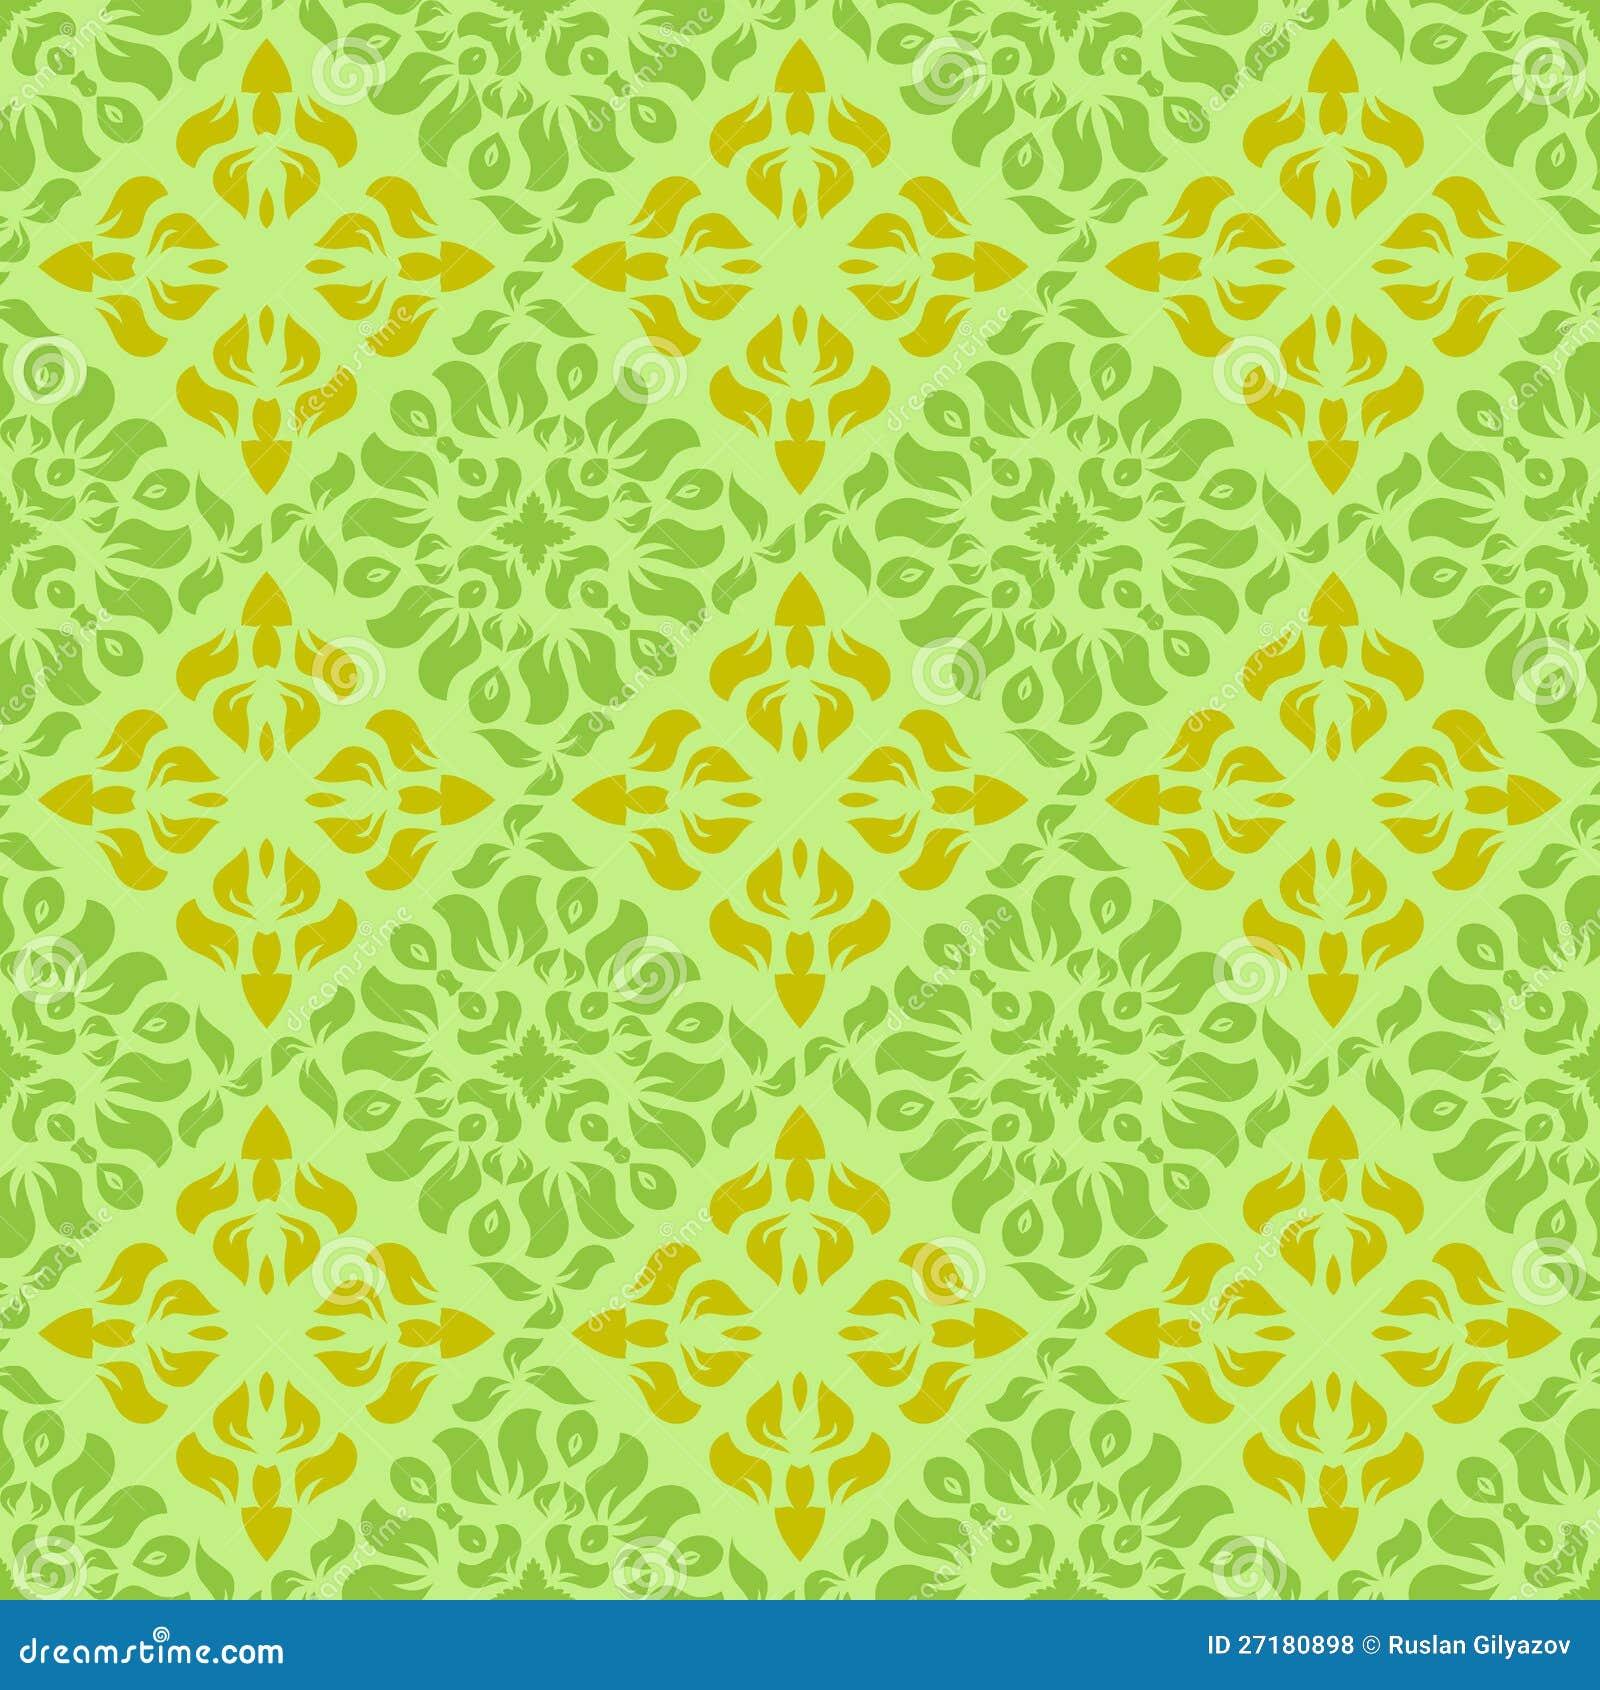 Green Yellow Wallpaper Pattern Illustration 27180898 Megapixl